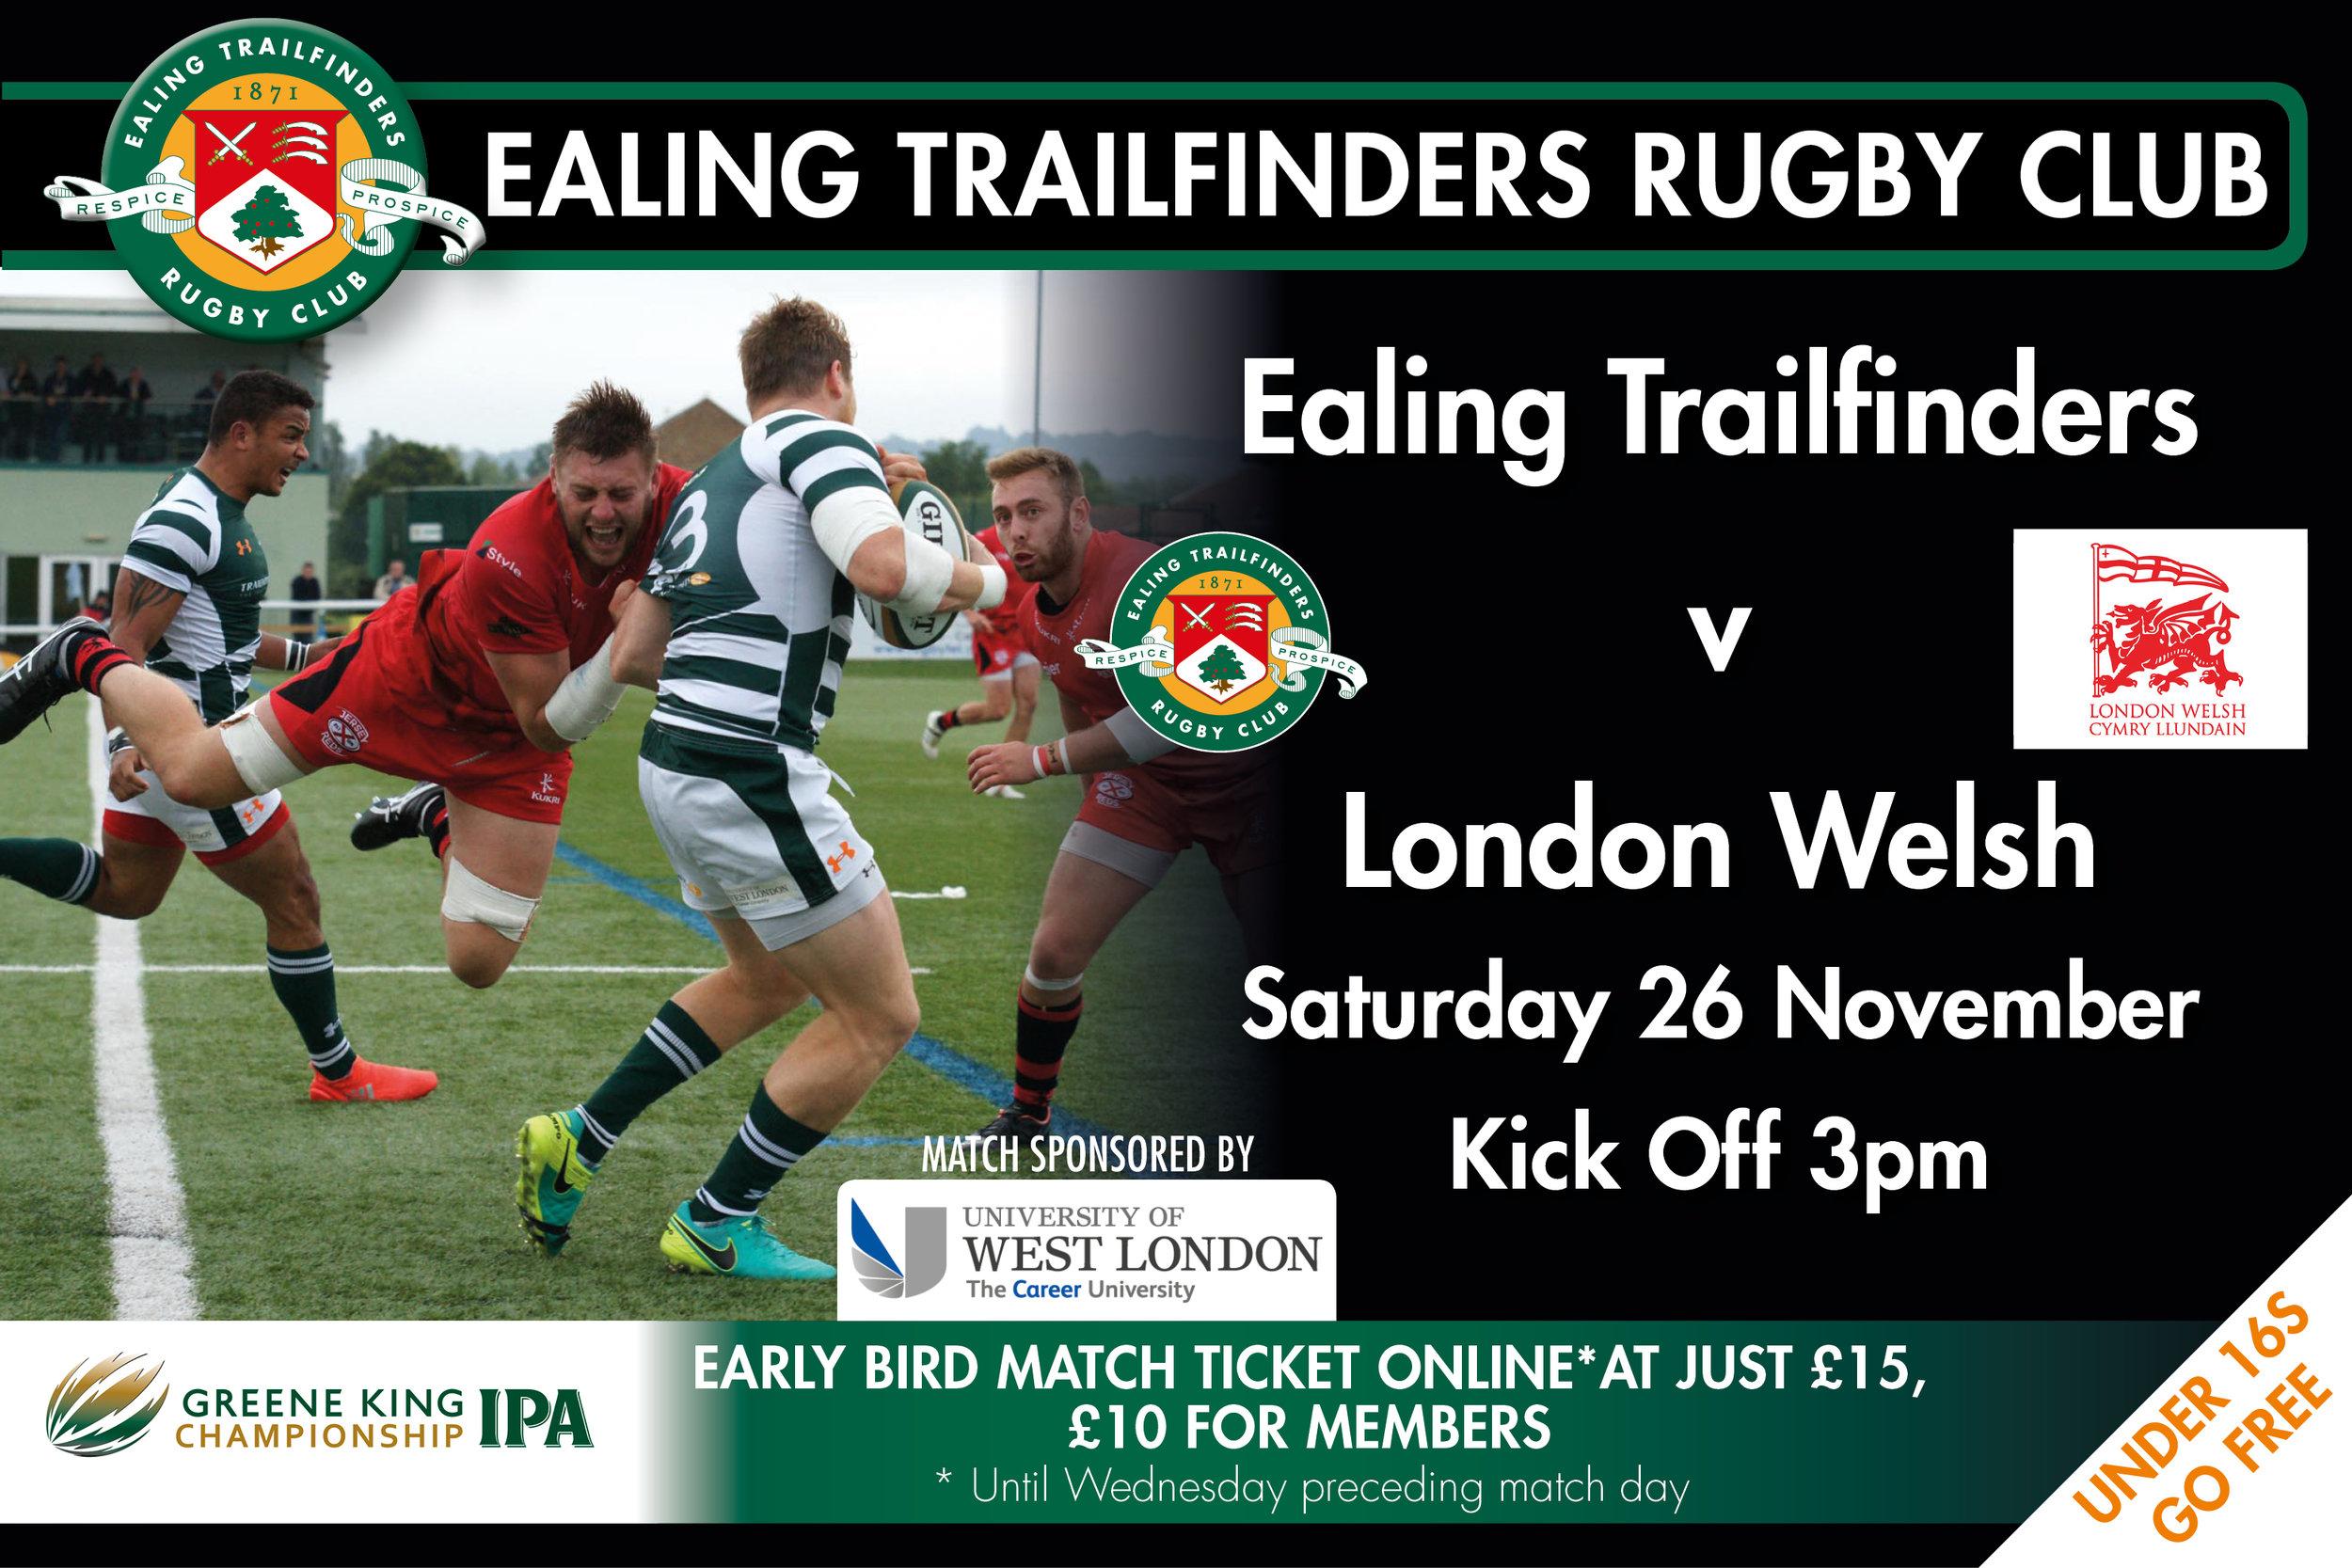 Ealing Trailfinders vs London Welsh. Saturday 26th November Kick off 3pm